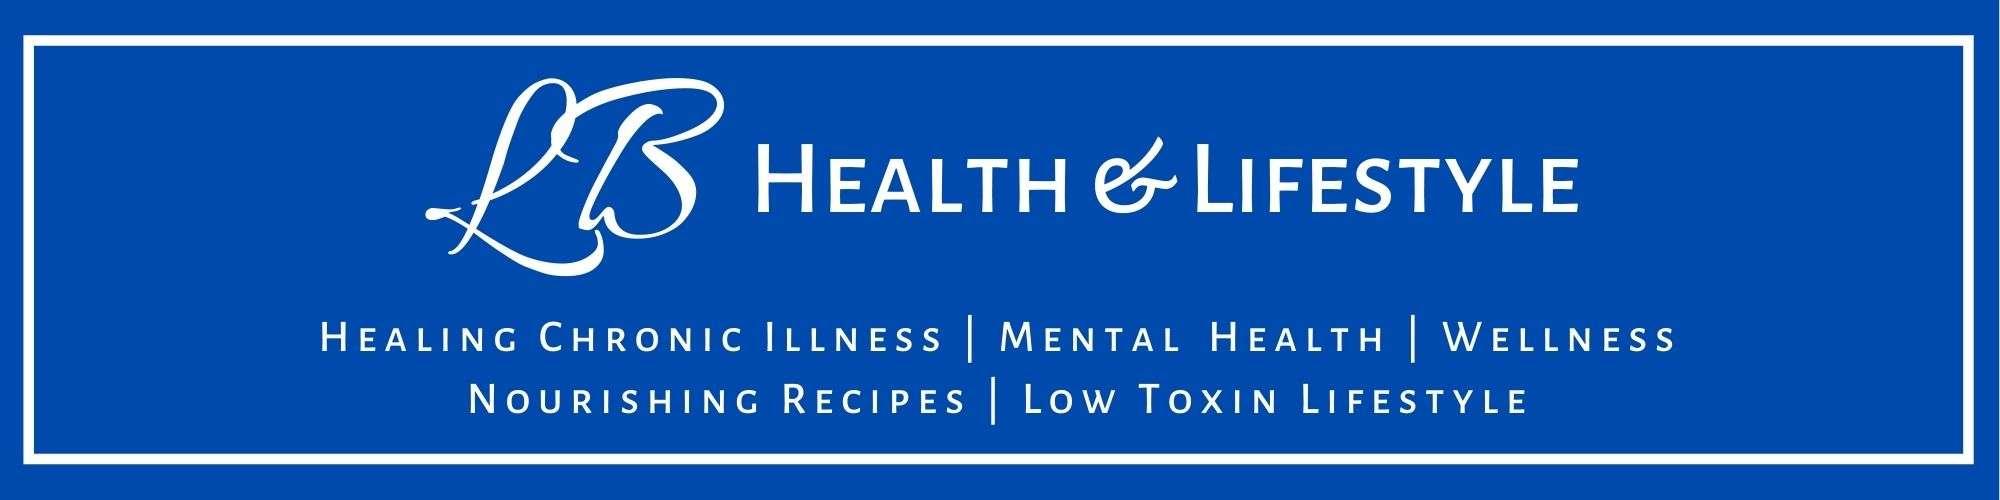 LB Health & Lifestyle